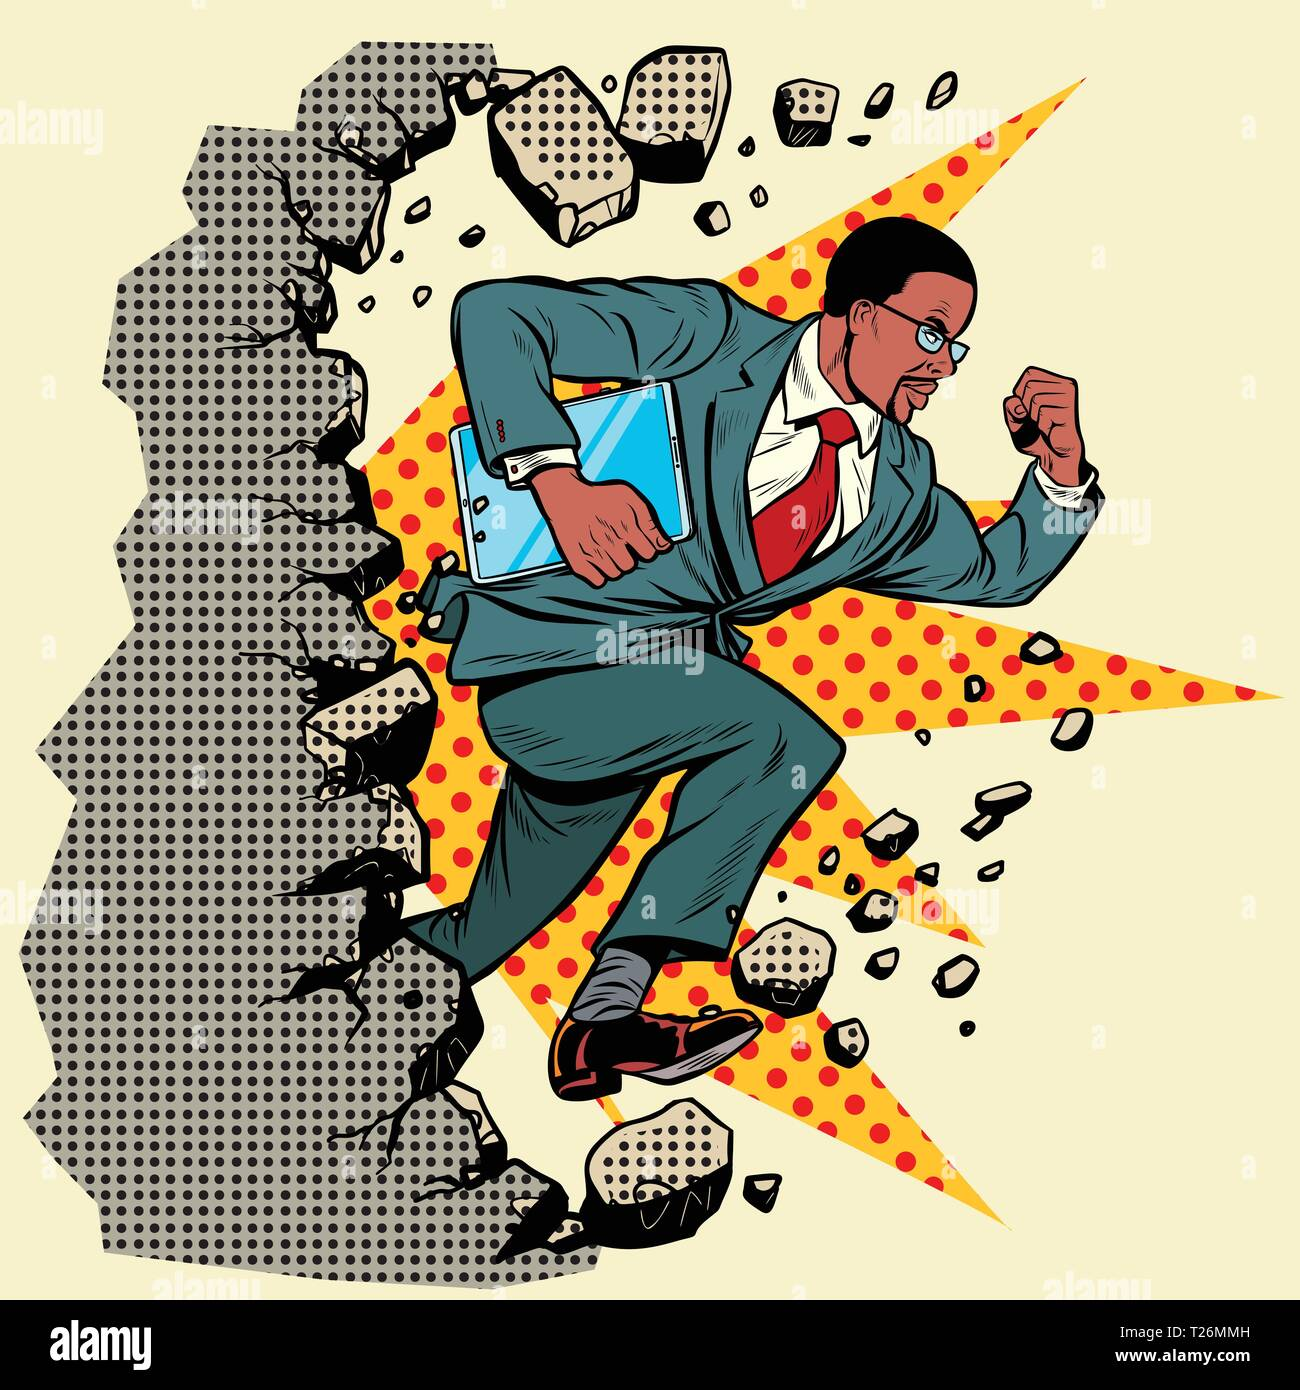 african Leader gadget novation breaks a wall, destroys stereotypes. Moving forward, personal development. Pop art retro vector illustration vintage ki - Stock Vector